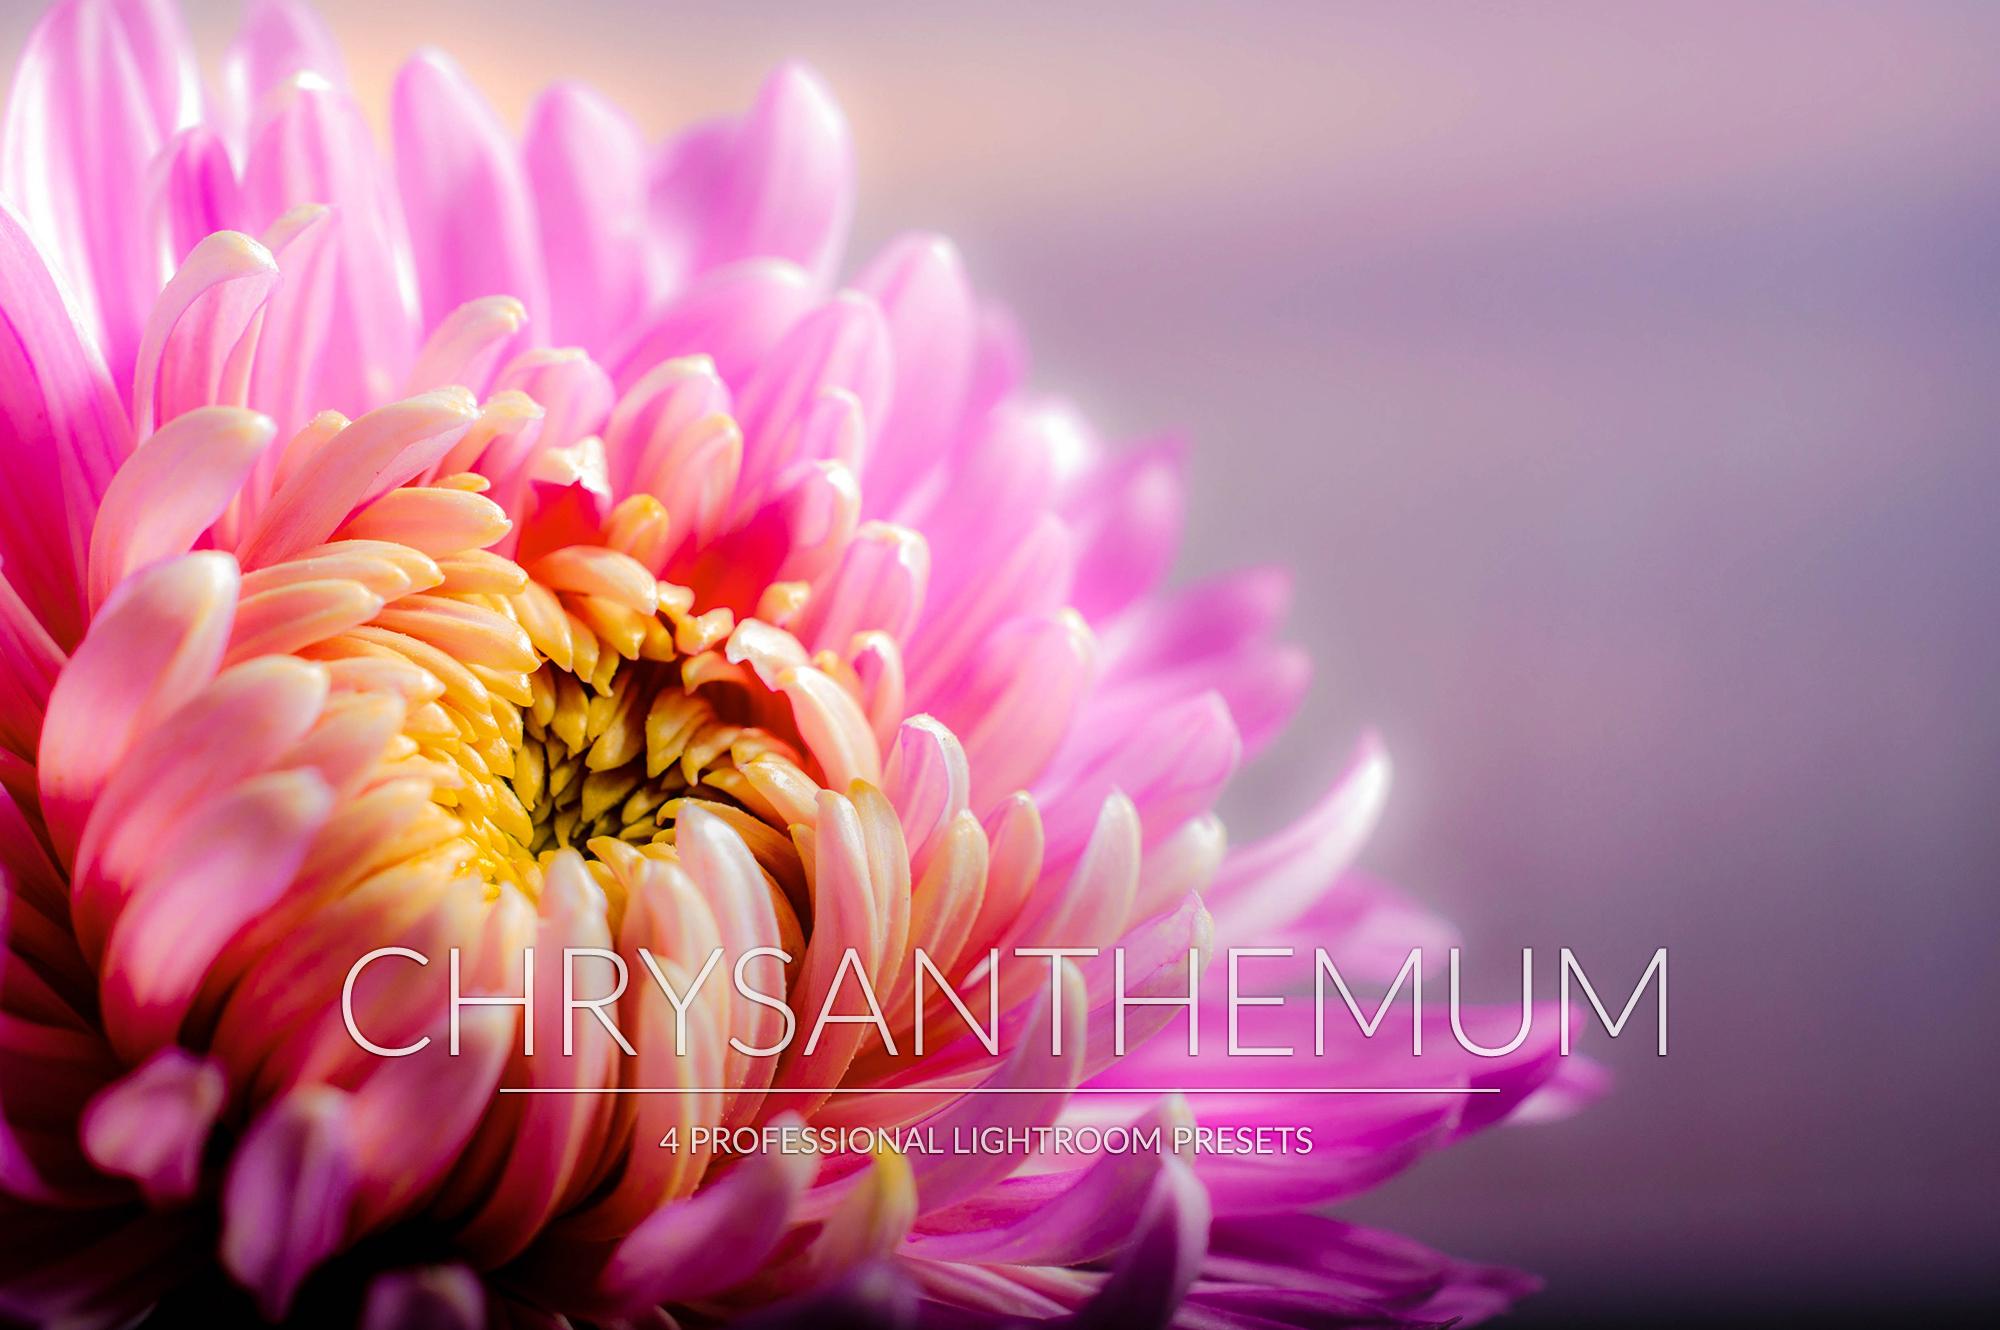 Chrysanthemum Lr Presets example image 1